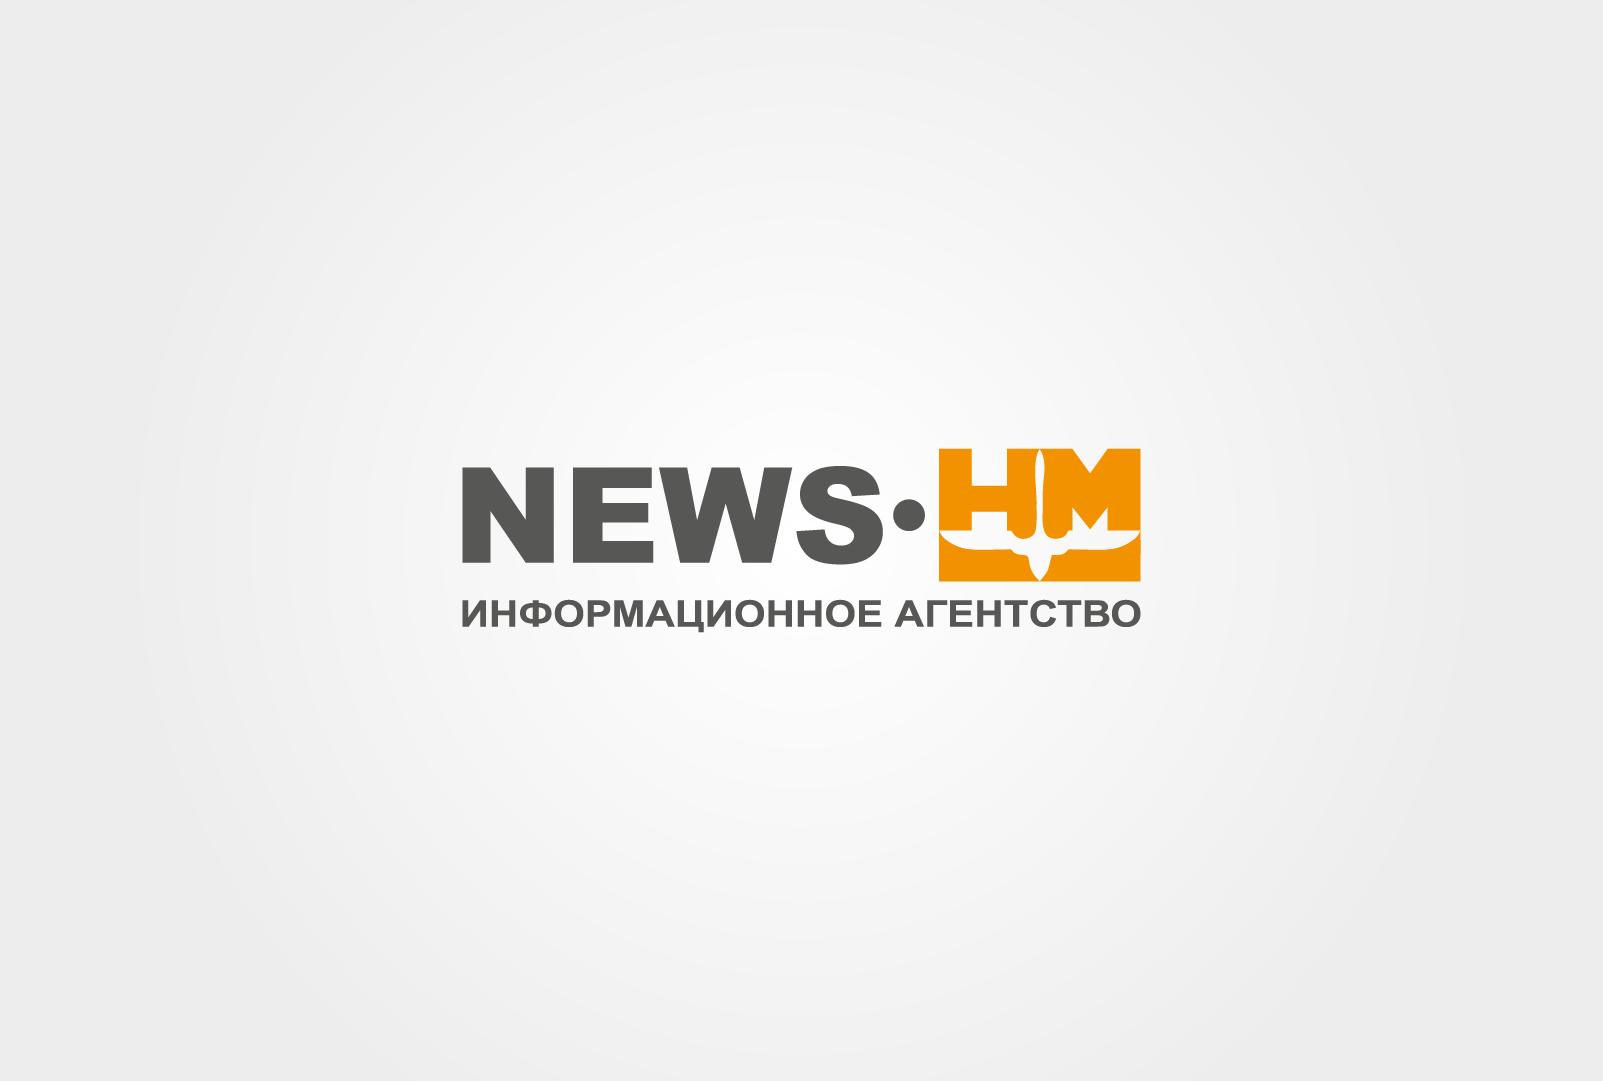 Логотип для информационного агентства фото f_2835aa5849c19ccf.png